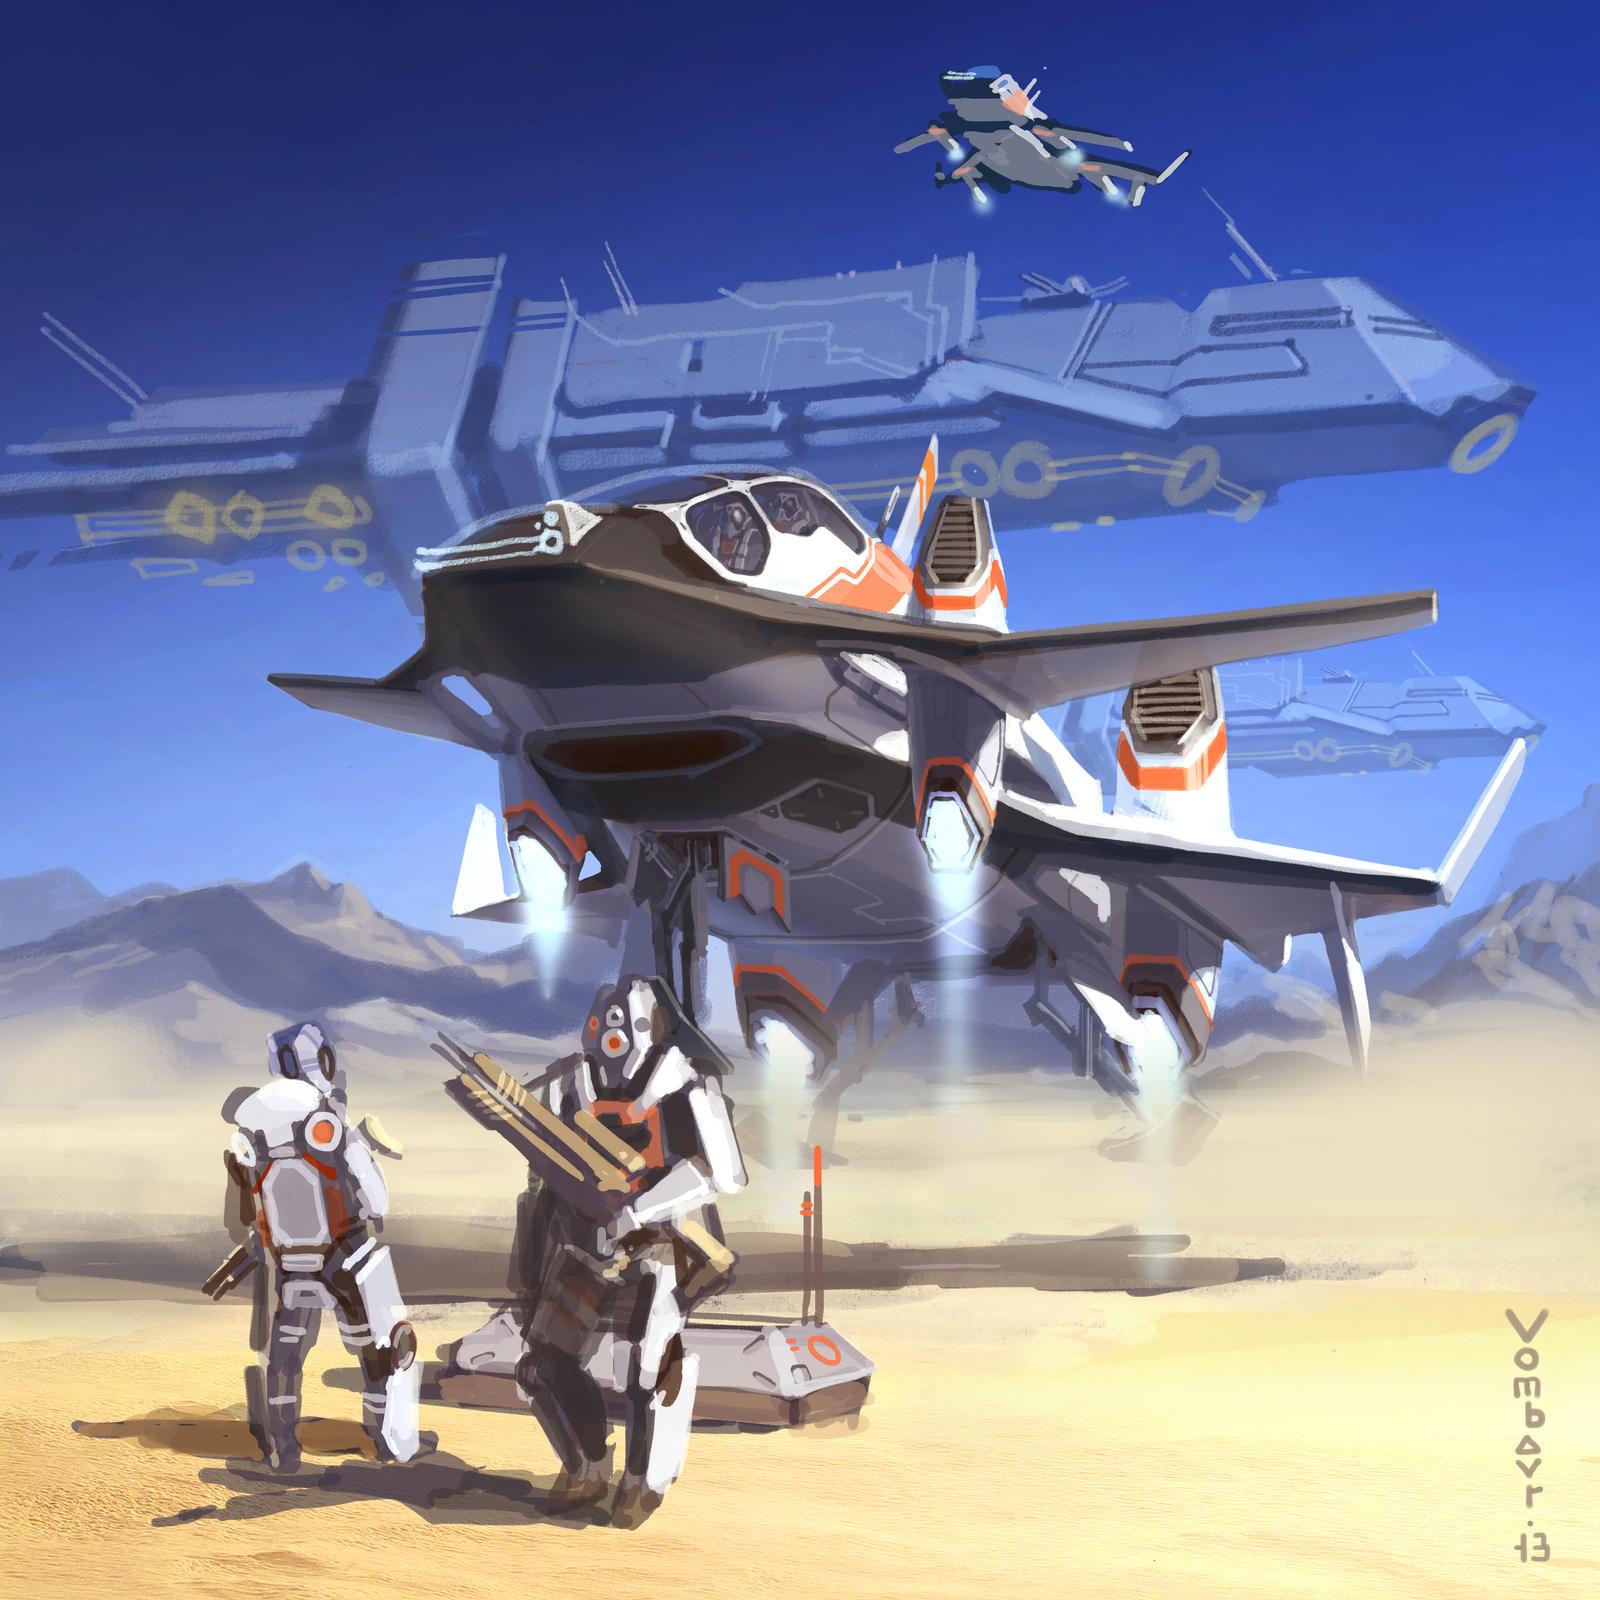 Shuttle11 by vombavr